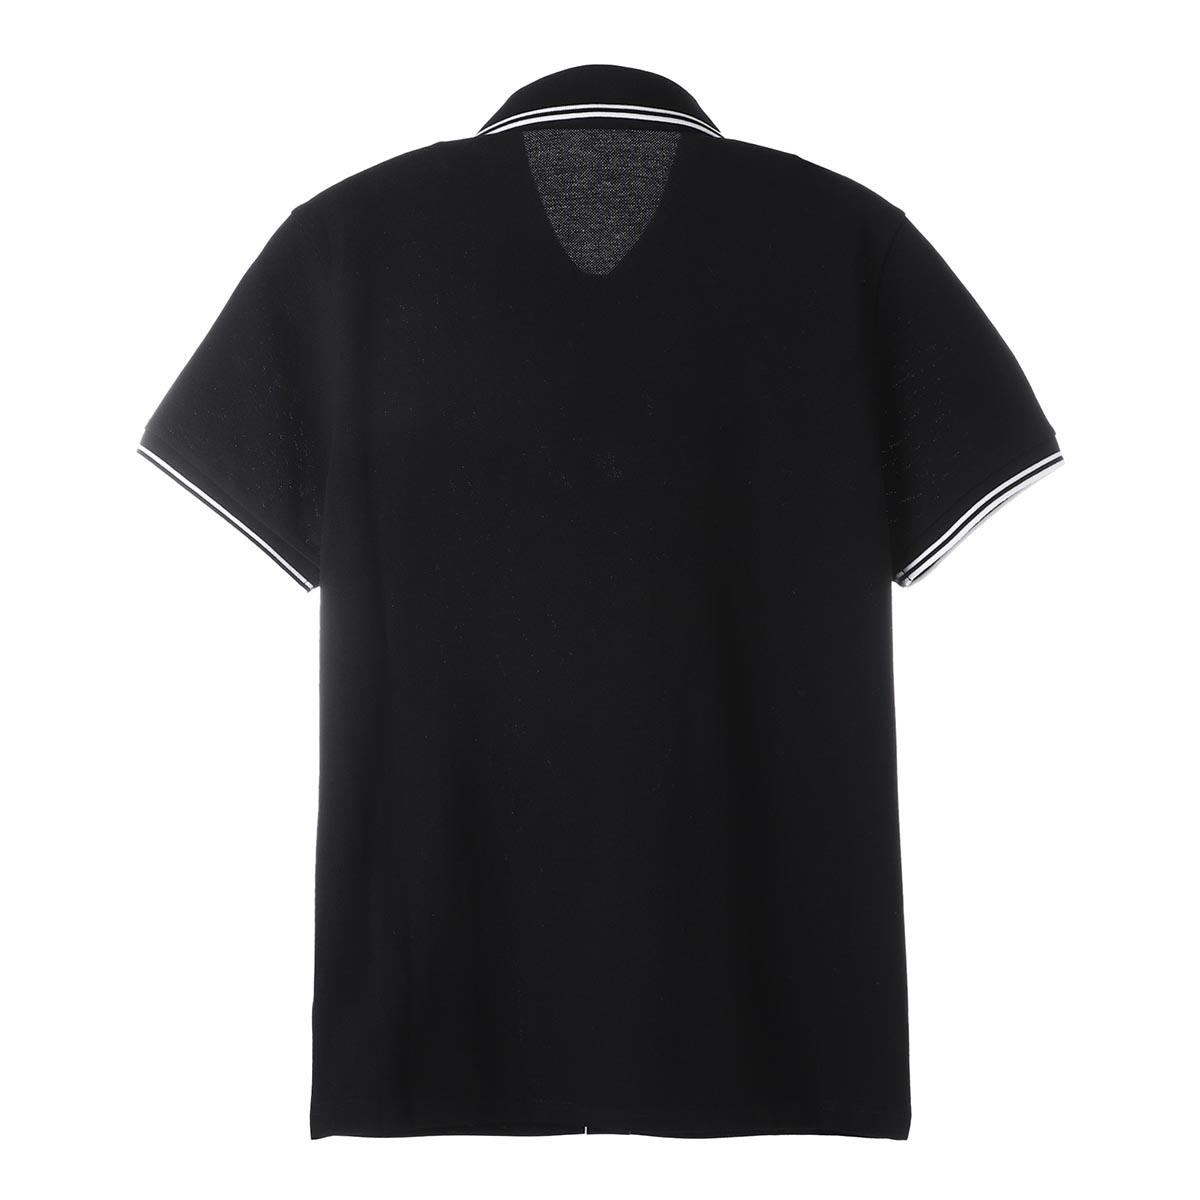 MONCLER モンクレール ポロシャツ メンズ